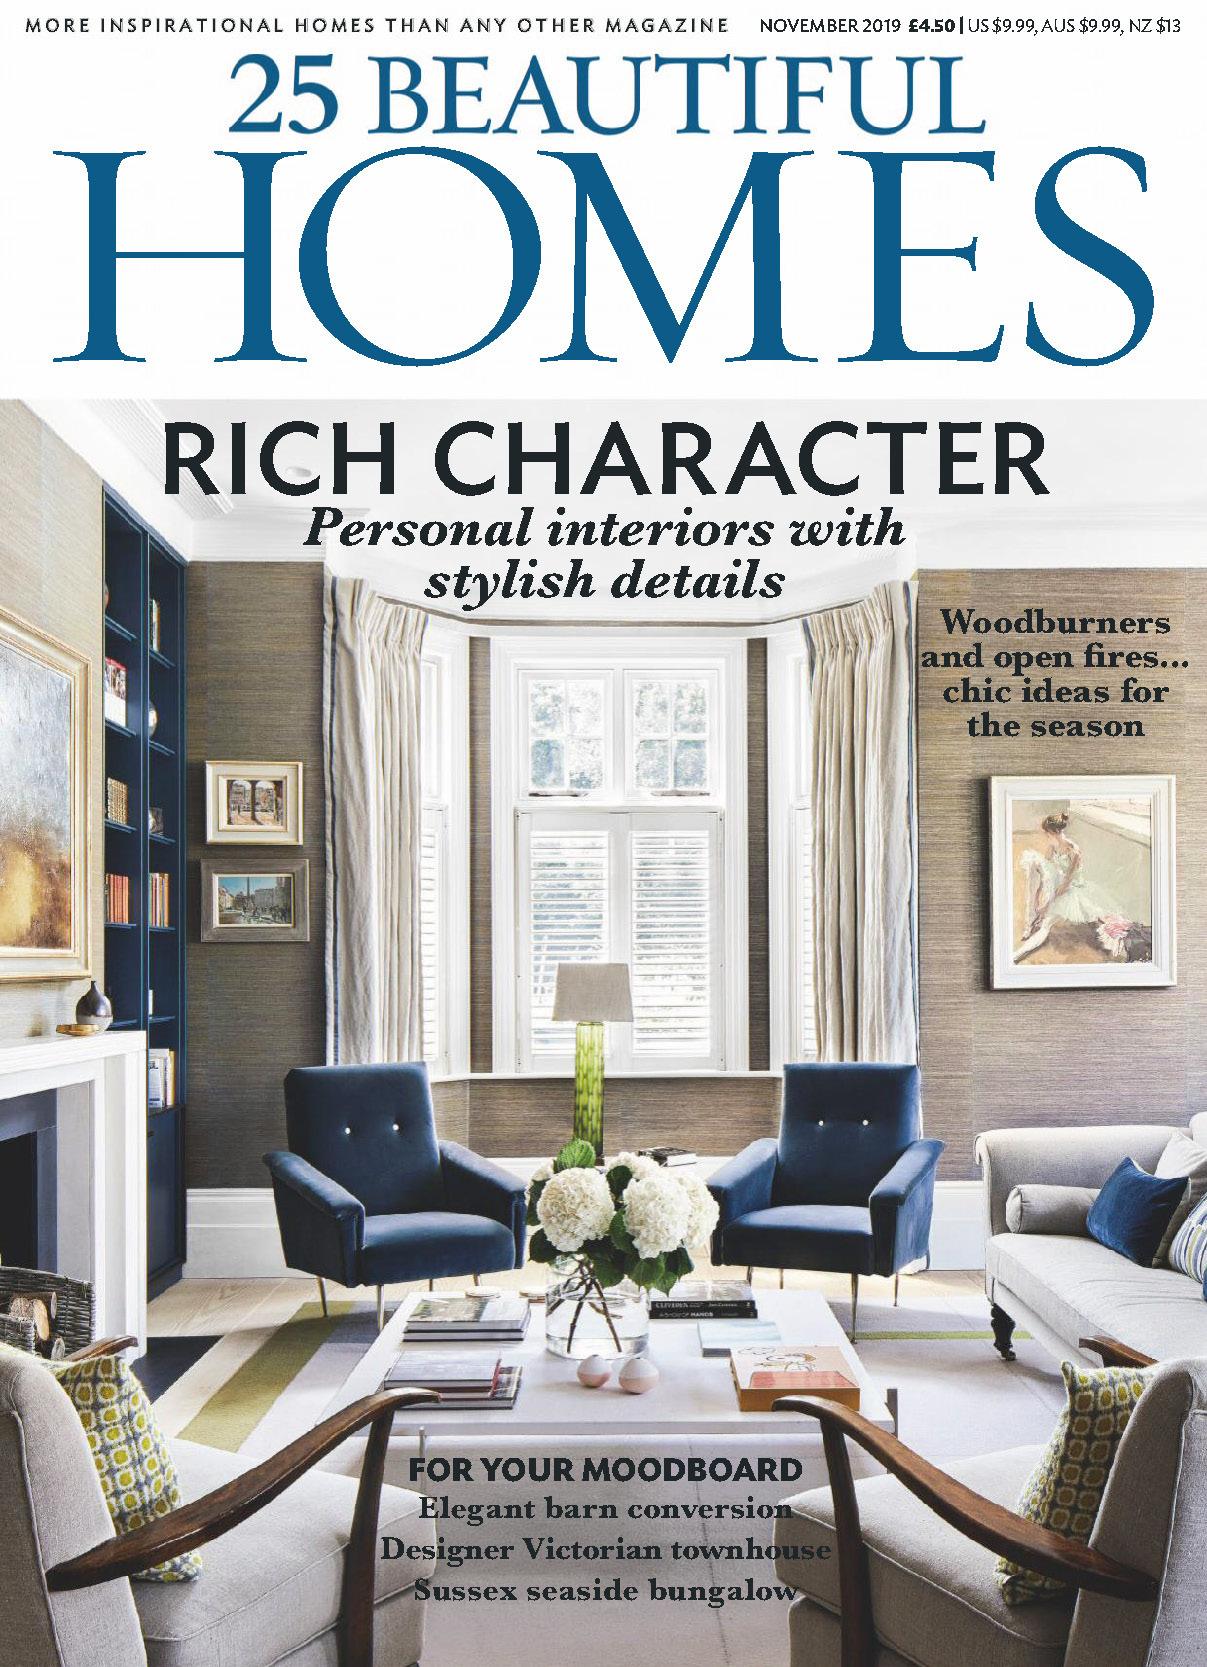 《25 Beautiful Homes》英國版時尚家居設計雜志2019年11月號